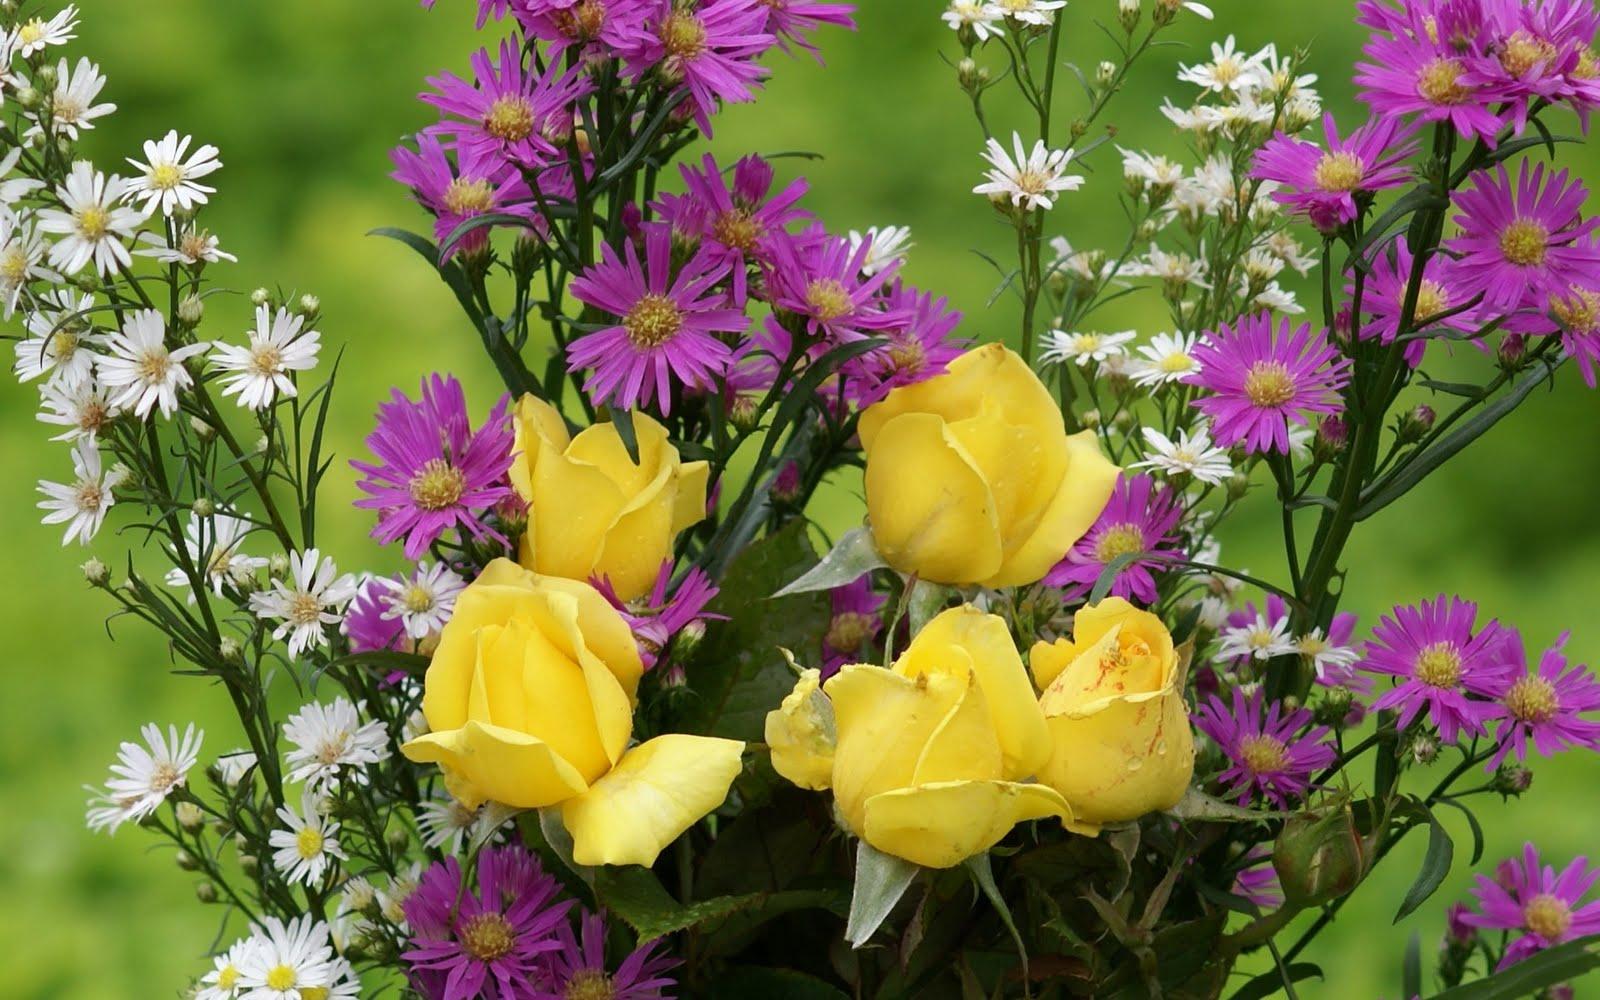 http://3.bp.blogspot.com/_BEyQraI-KQQ/SxSxBnPSpGI/AAAAAAAADt8/ruf7GHaqdiE/s1600/love_roses-dsc02878-a1.jpg